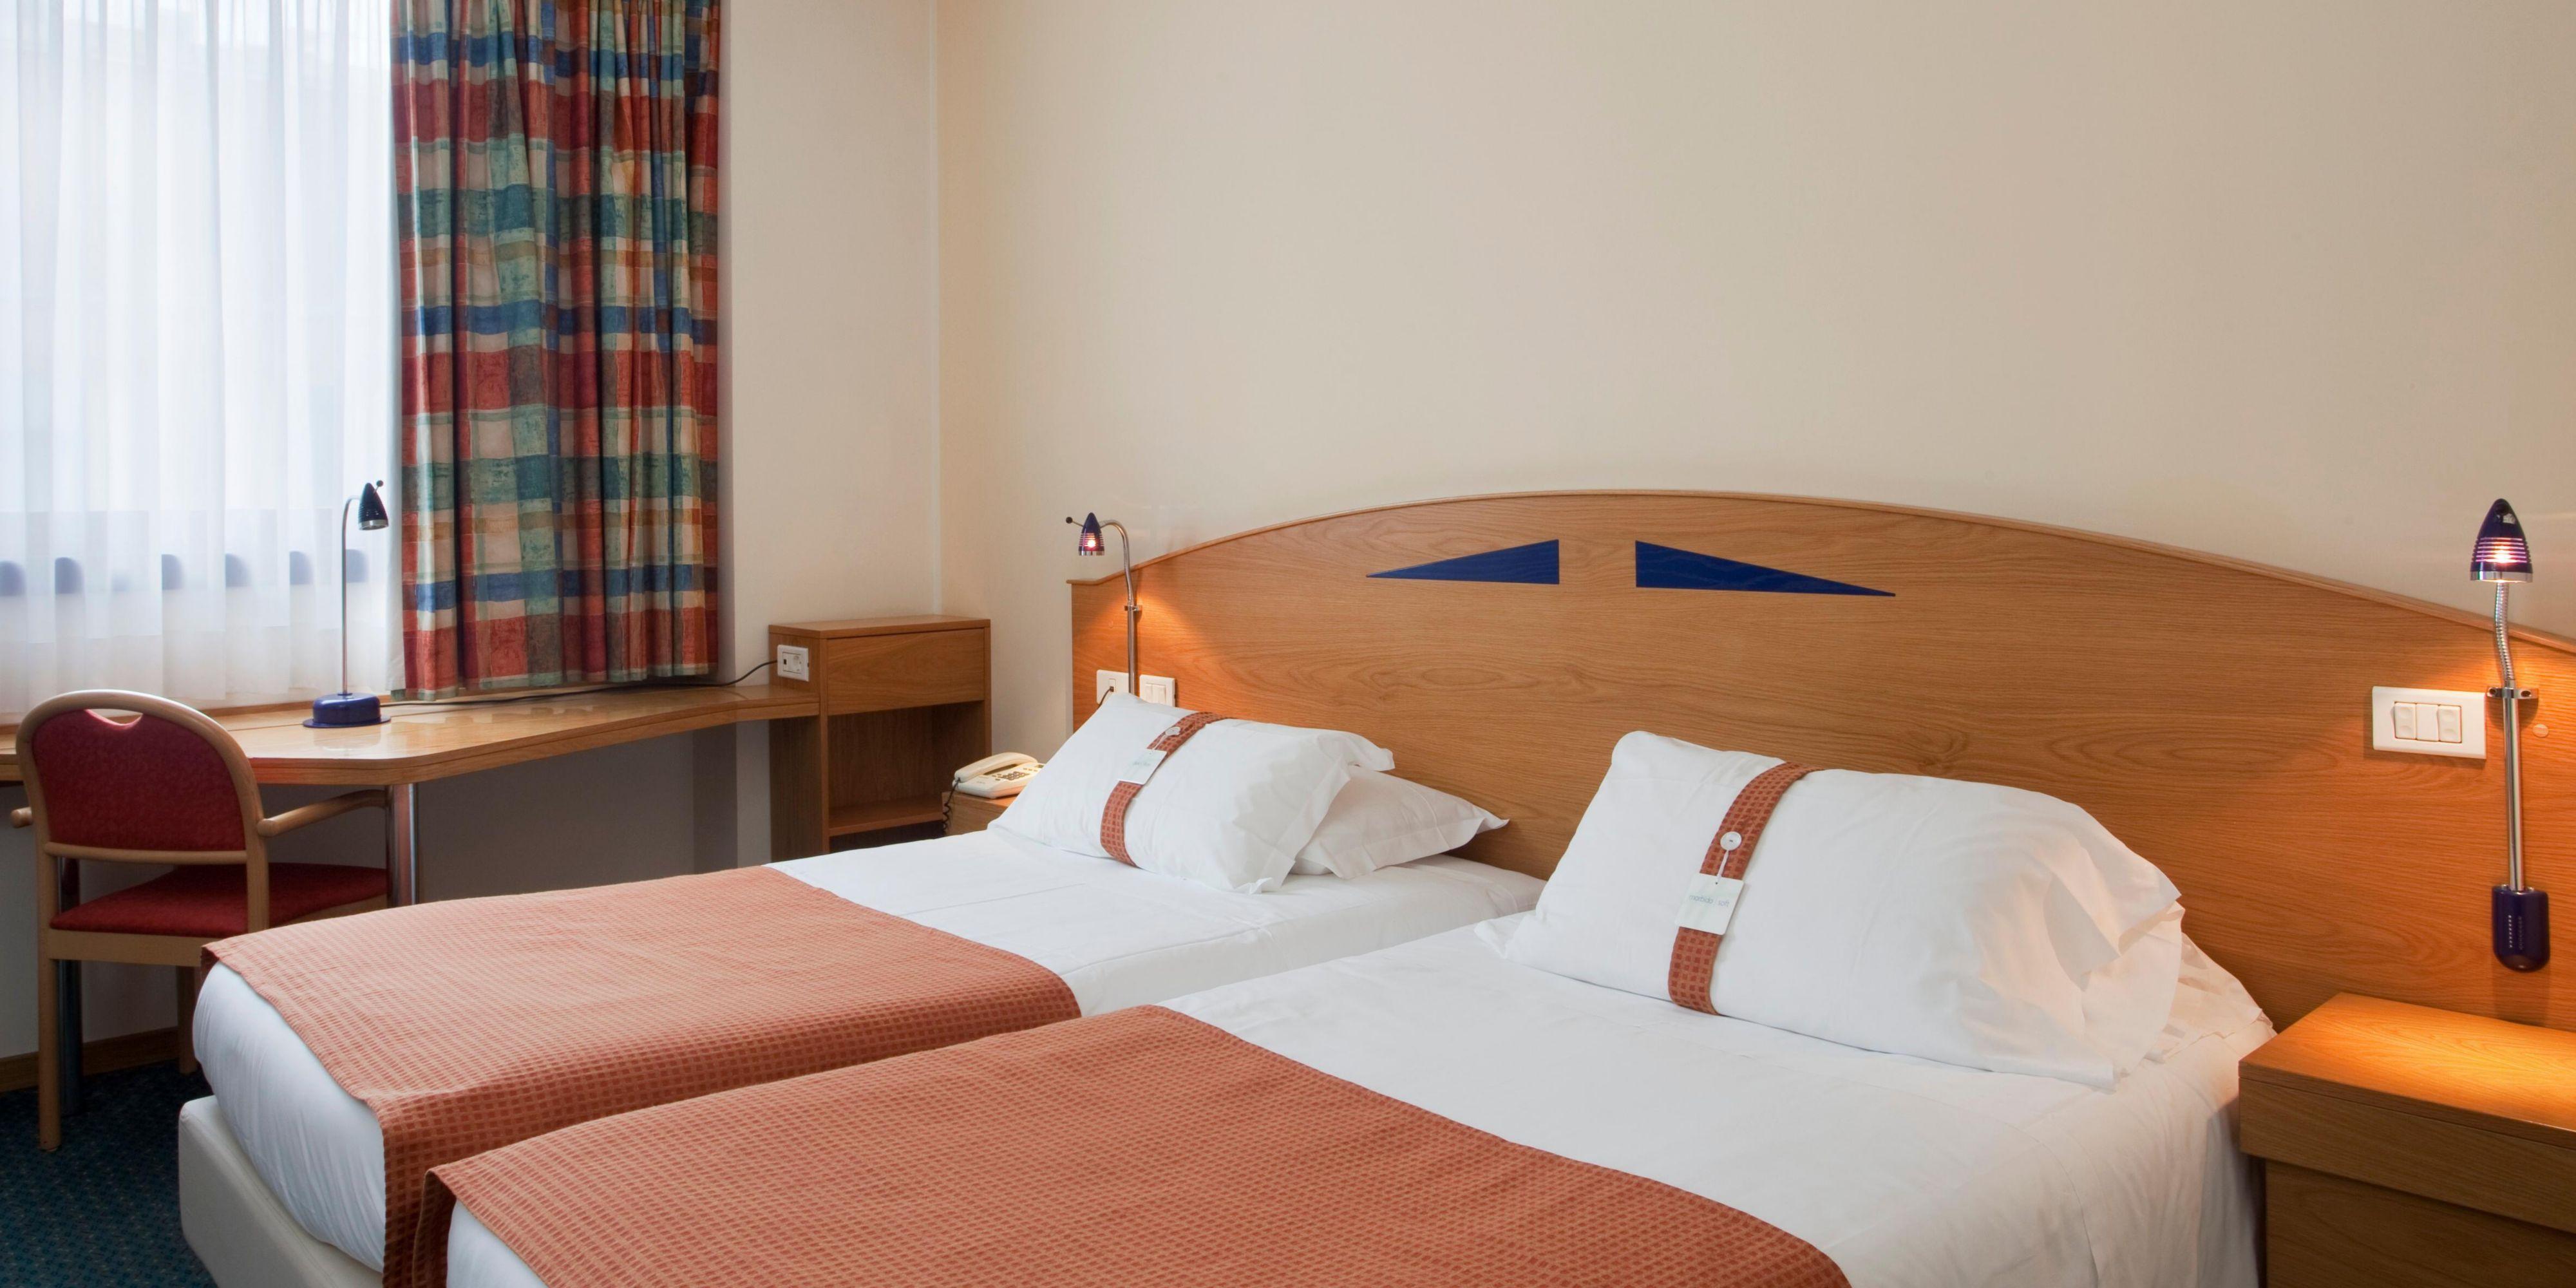 Holiday Inn Express Foligno Hotel by IHG